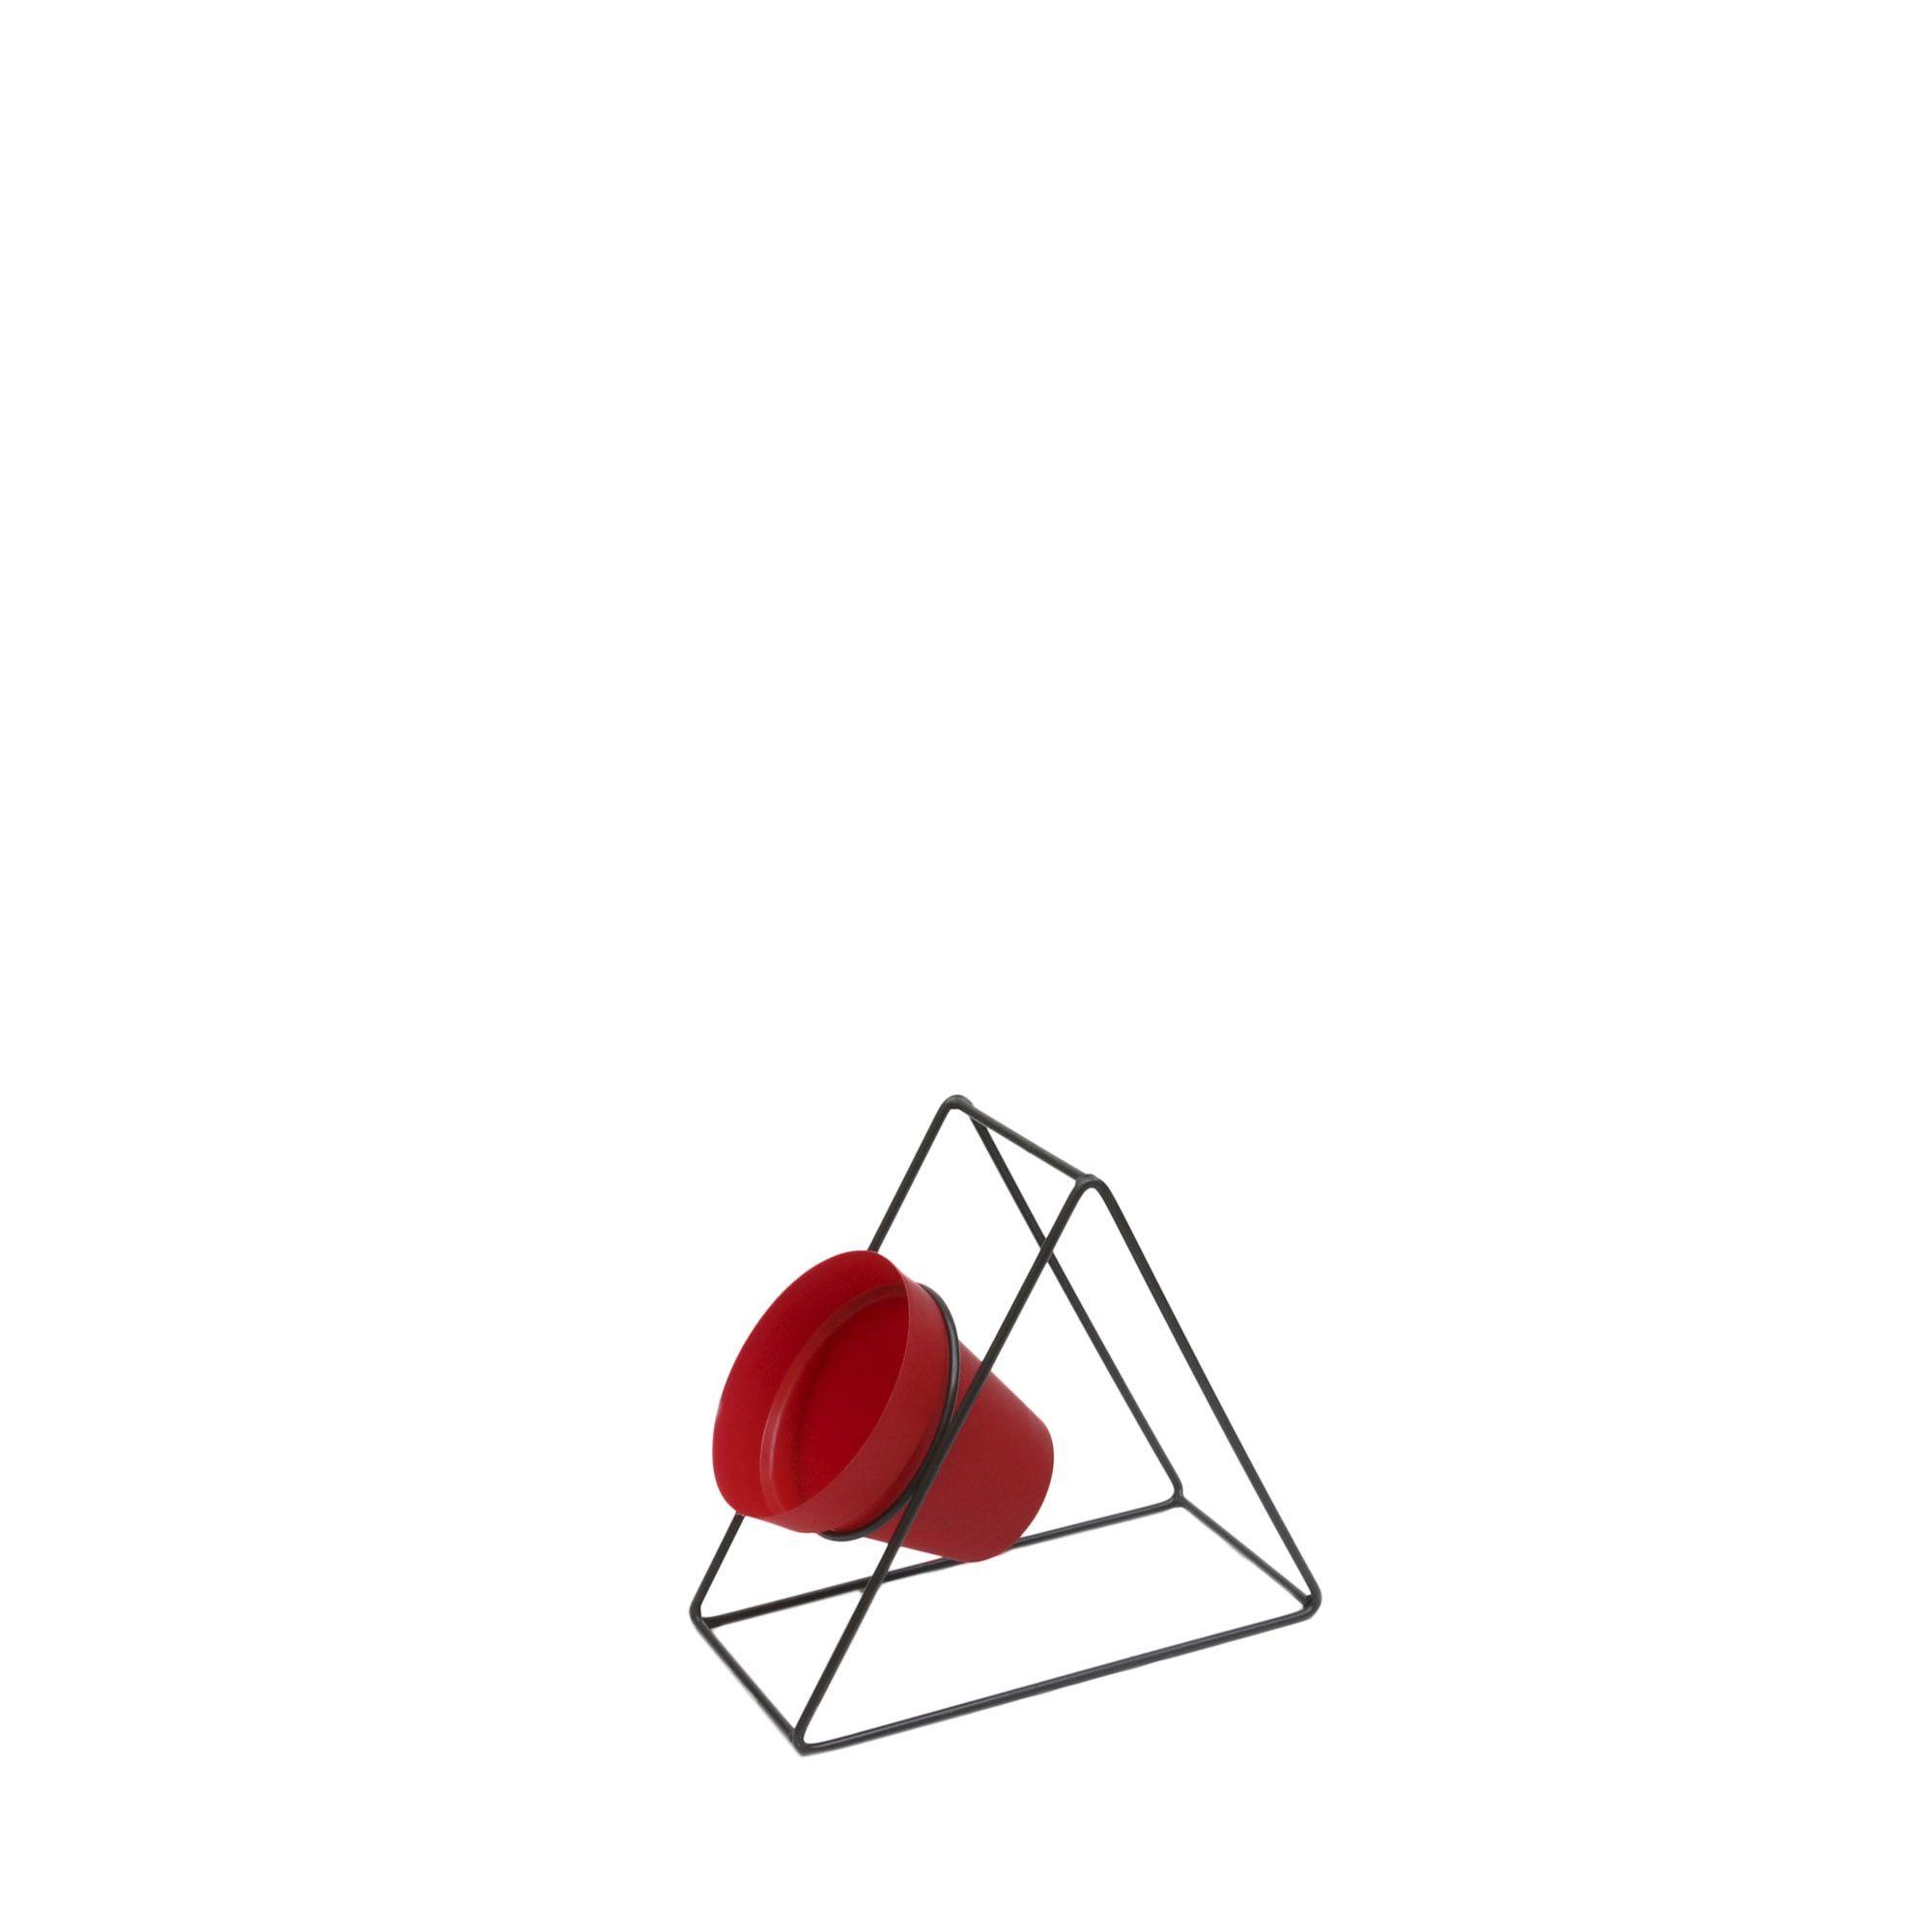 Suporte Ferro Triângulo Parede 24 x 24 cm Gratite/Preto Vasart